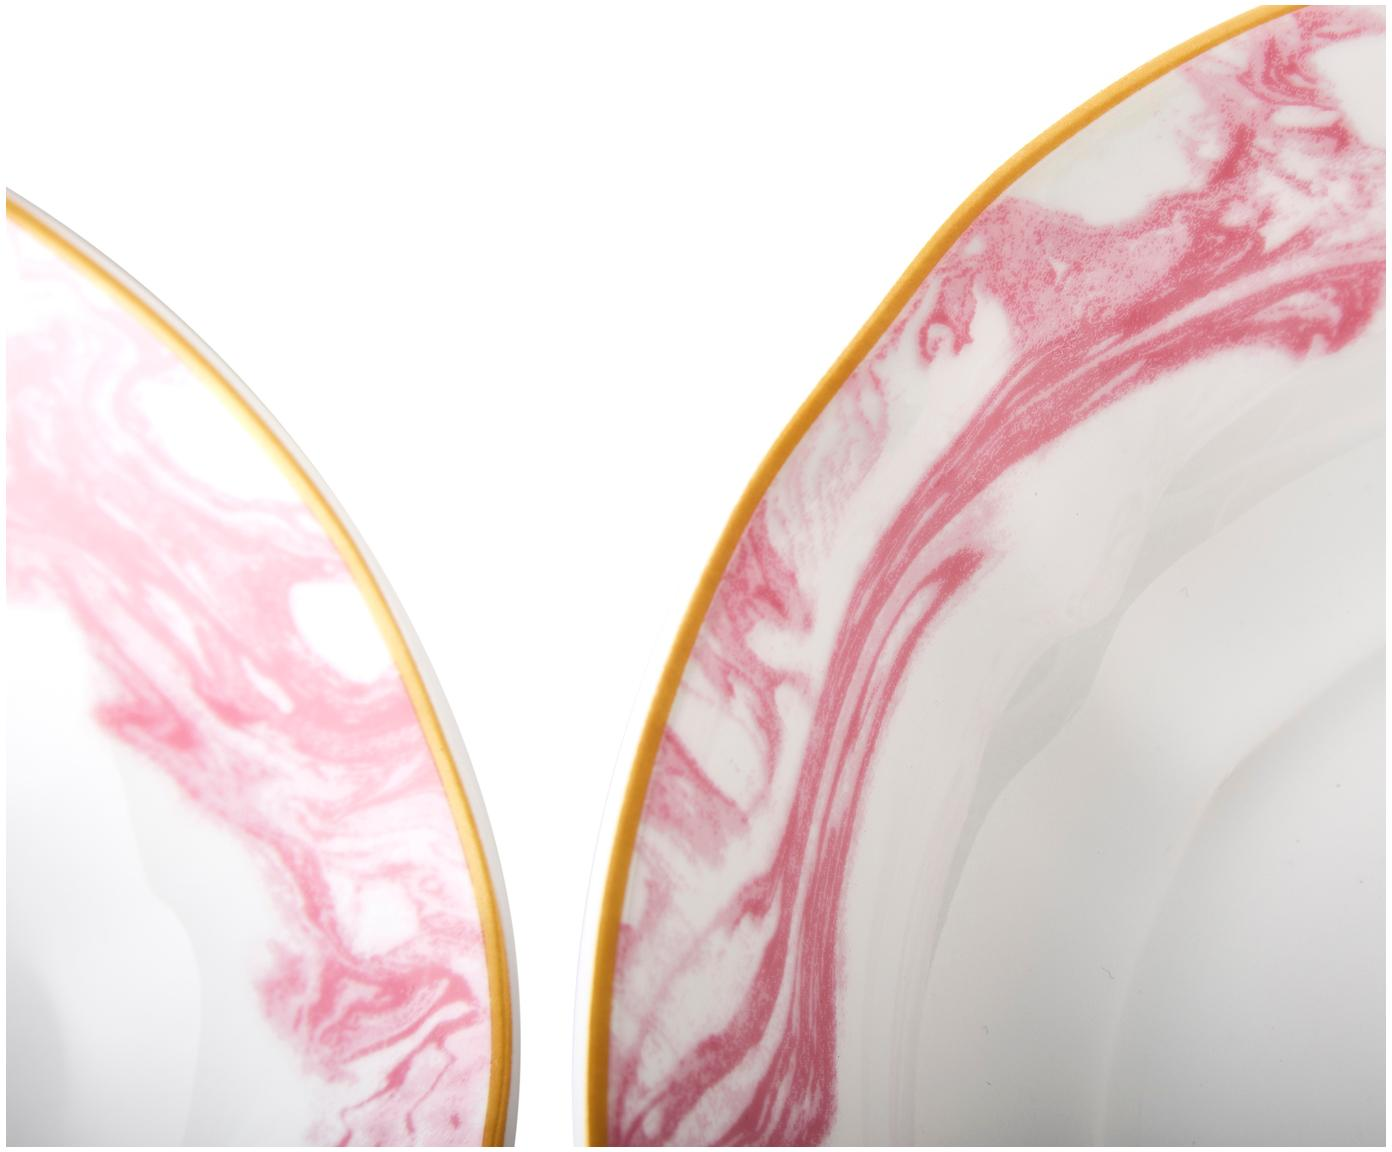 Piatti fondi Bubblegum, 4 pz., Porcellana, Bianco, rosa, dorato, Ø 21 x Alt. 5 cm